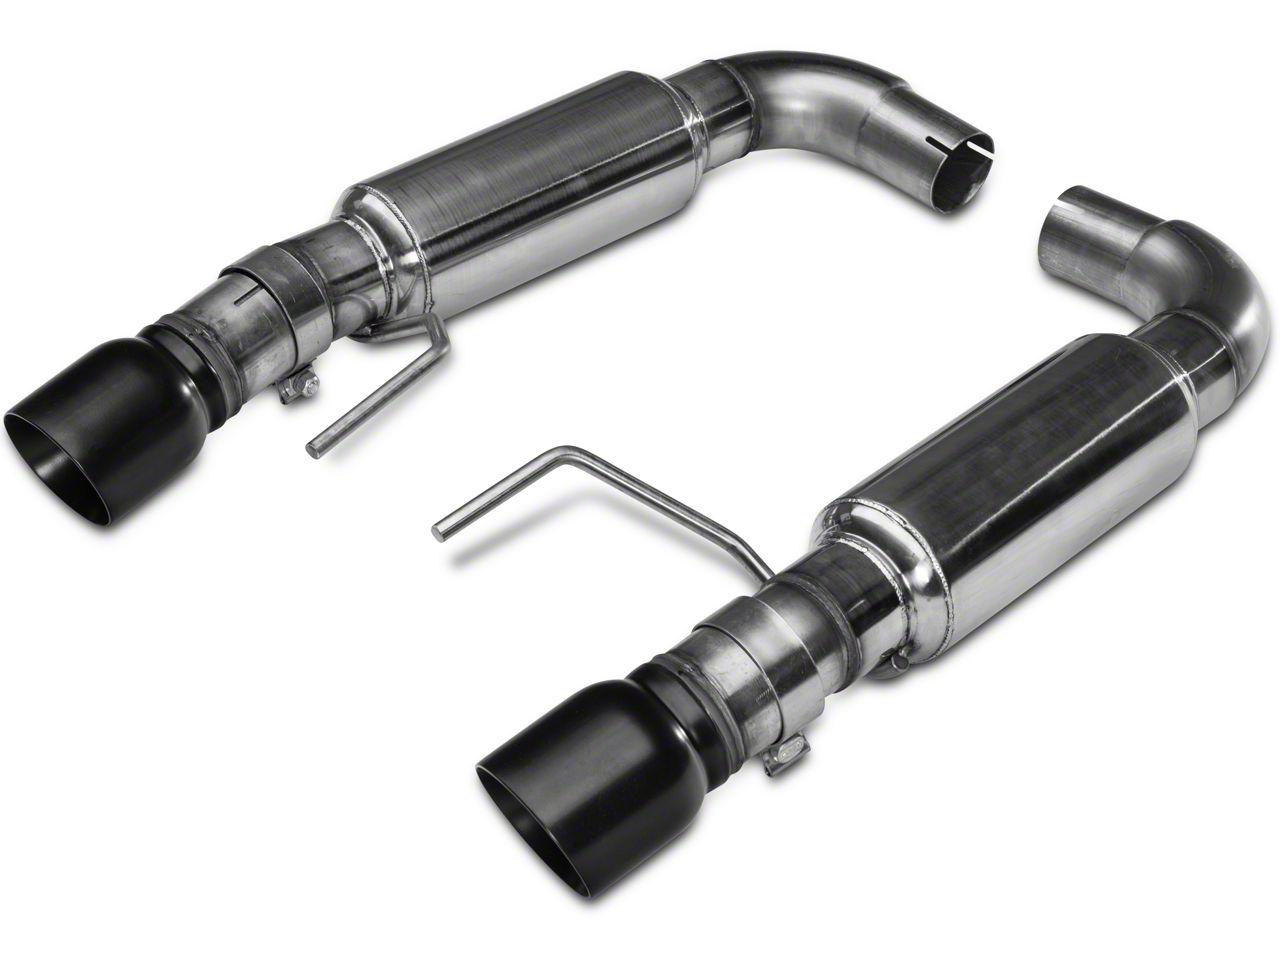 Kooks Axle-Back Exhaust - Black Tips (15-17 GT Fastback)